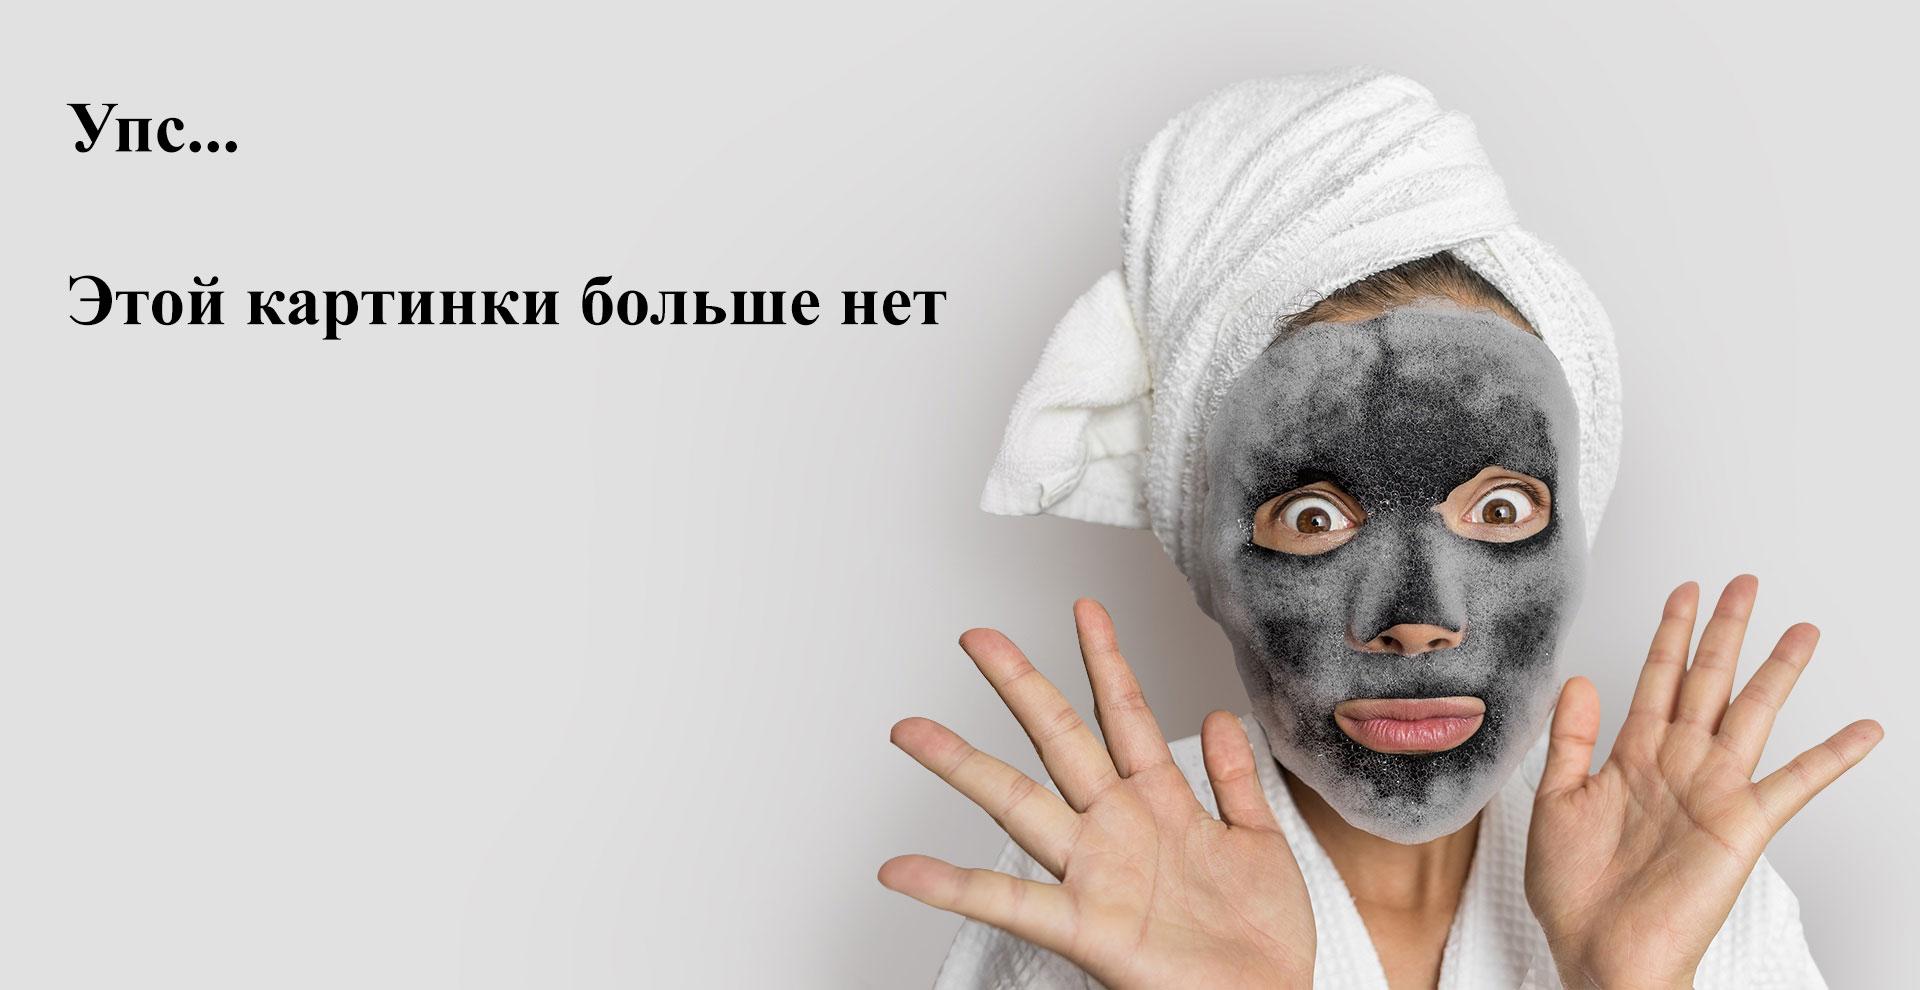 Vichy, Шампунь Dercos Densi-Solutions, 250 мл